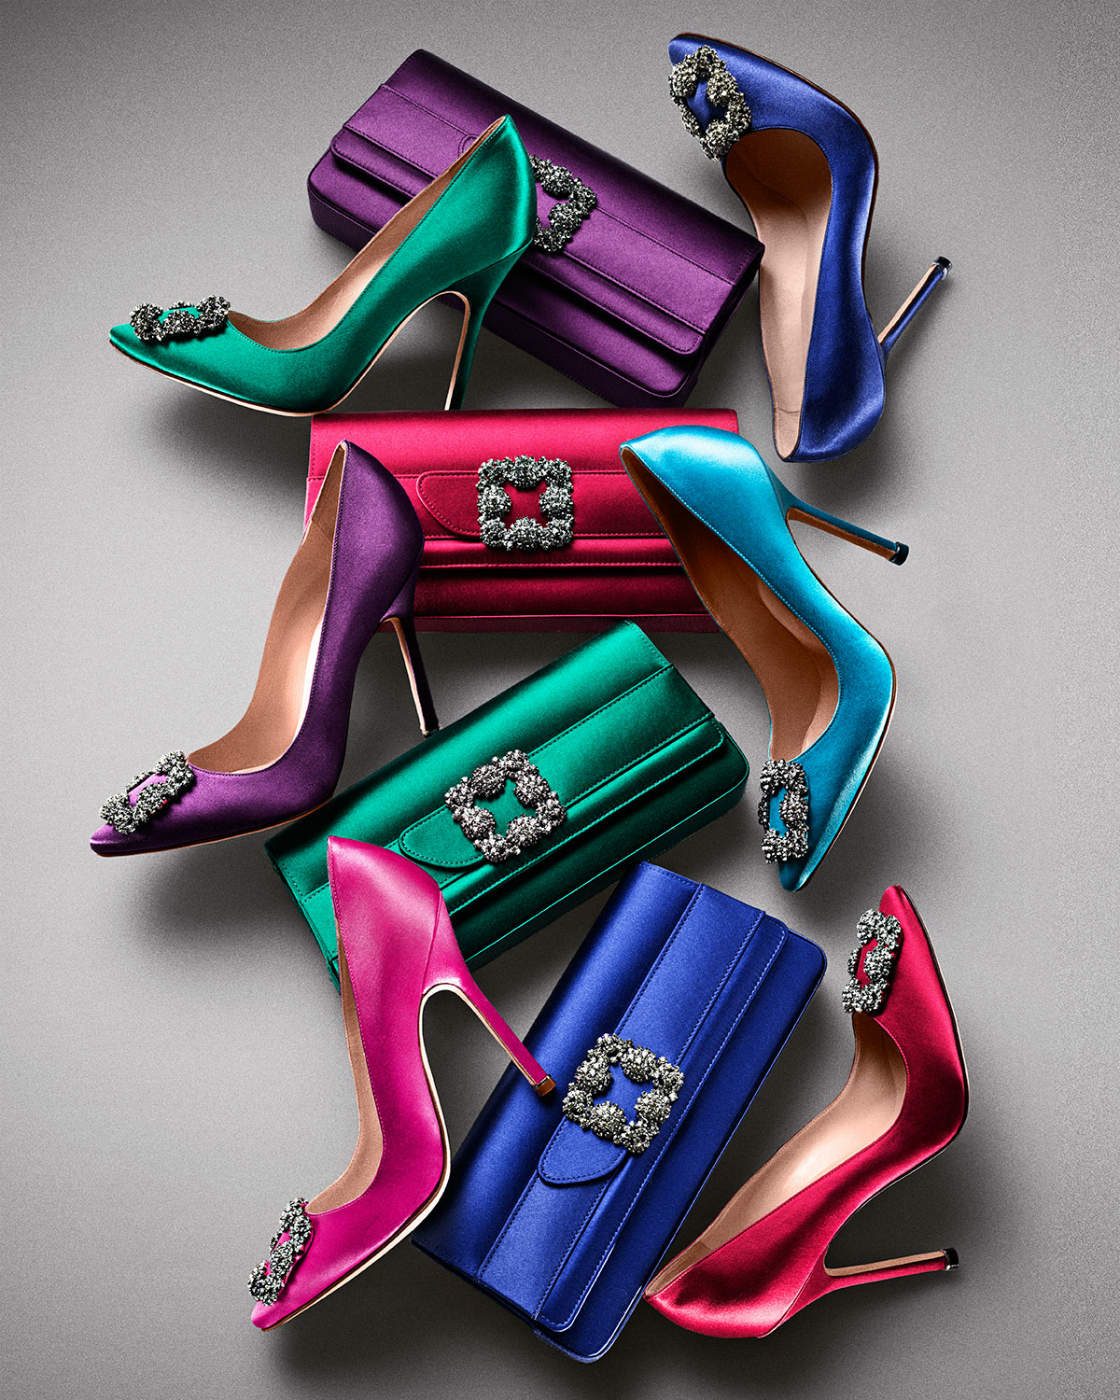 5 Spanish Fashion Brands That You Should Know Spanish Fashion Brands 5 Spanish Fashion Brands That You Should Know cc722660fdd140de9ba9f8862dafc488